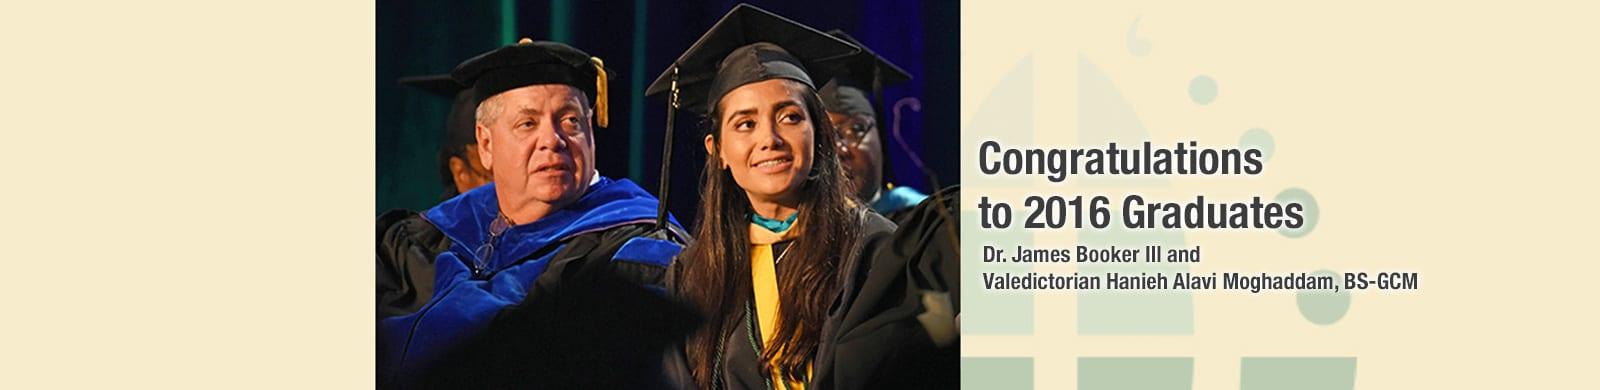 2016 Potomac Graduates, Valedictorian